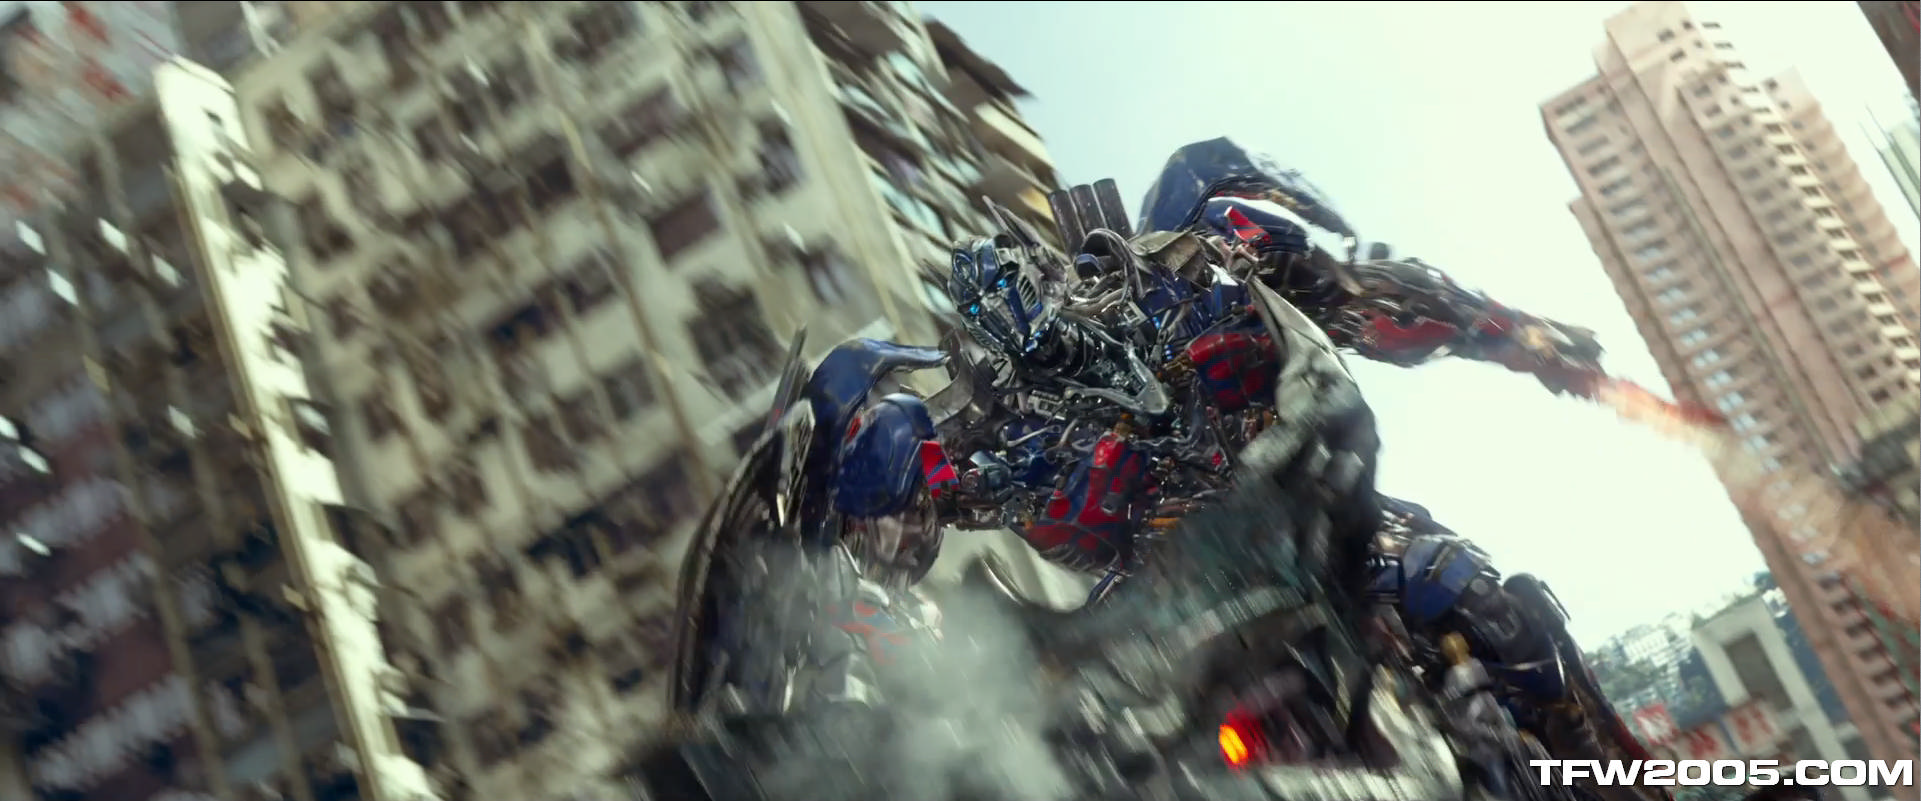 http://www.tfw2005.com/transformers-news/attach/1/AoE-Trailer-3-Screen-Caps-085_1400142741.jpg